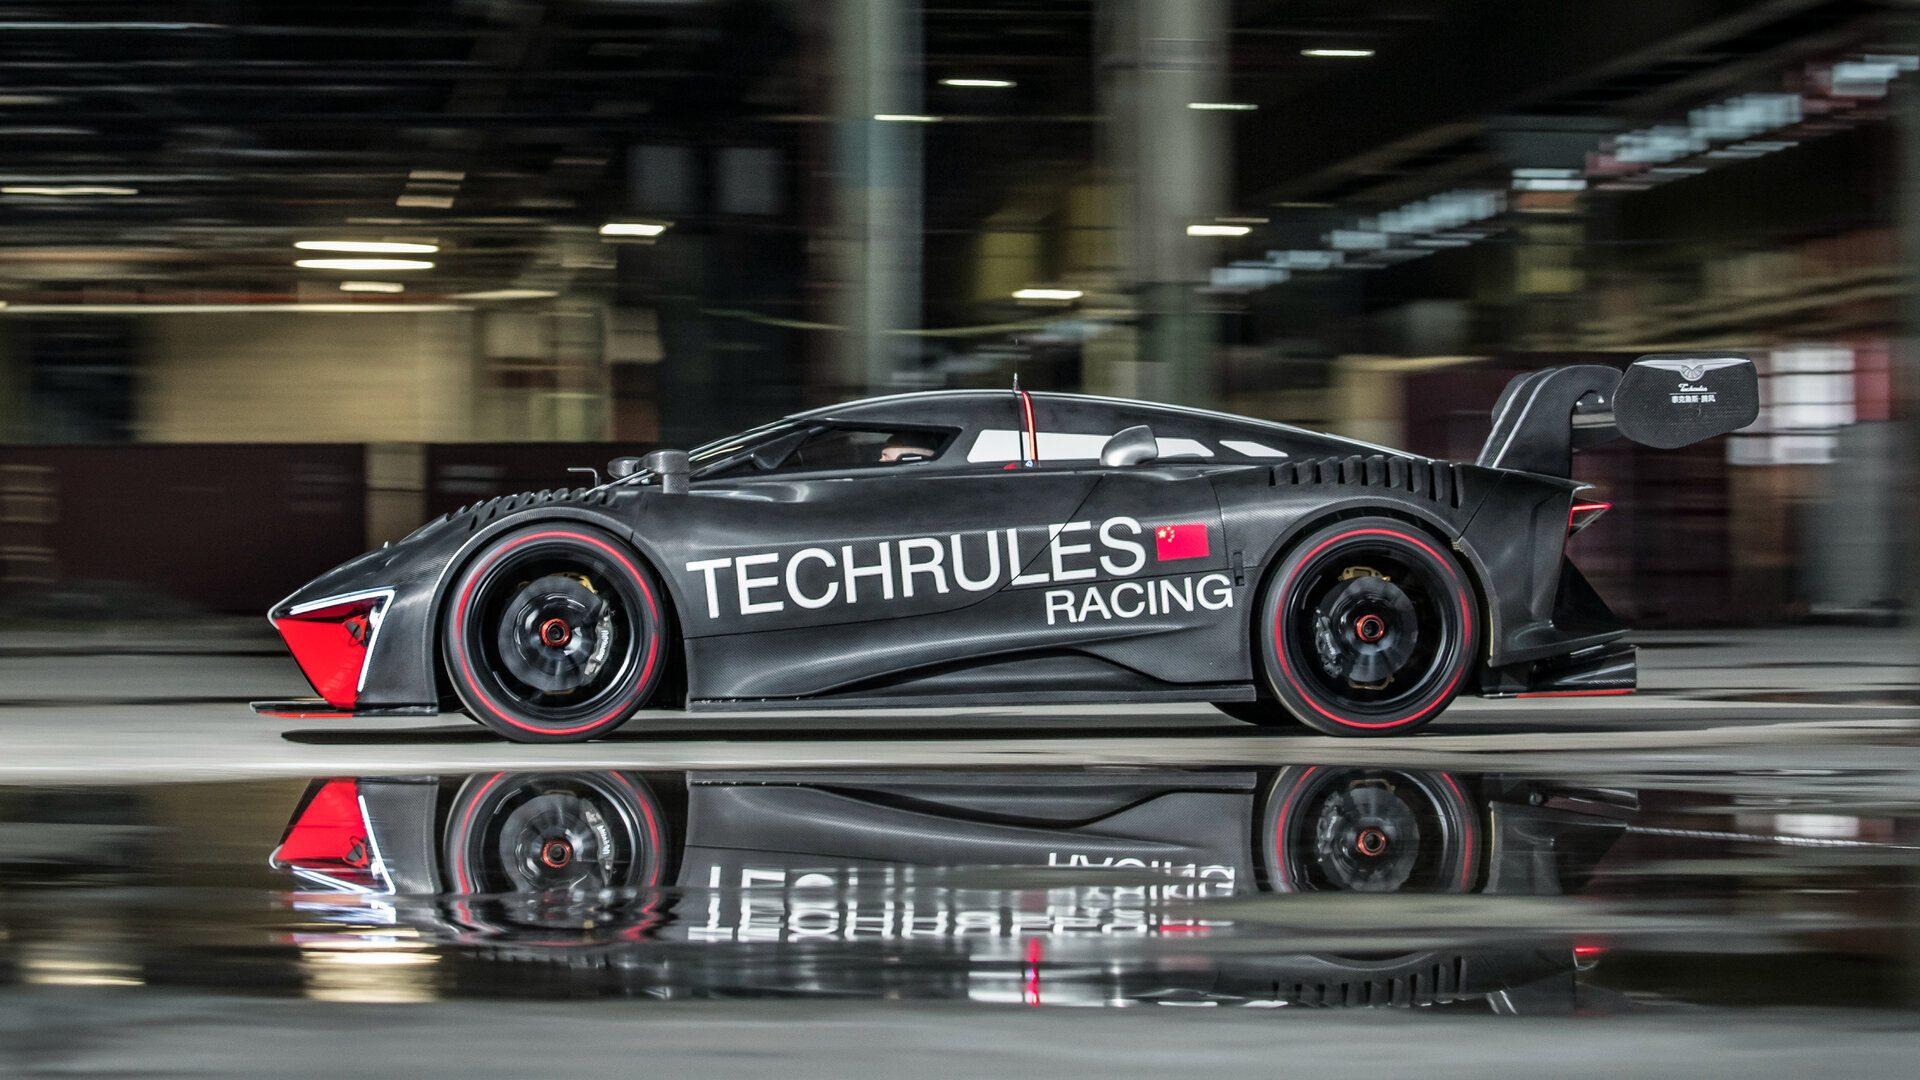 Coche del día: Techrules Ren RS